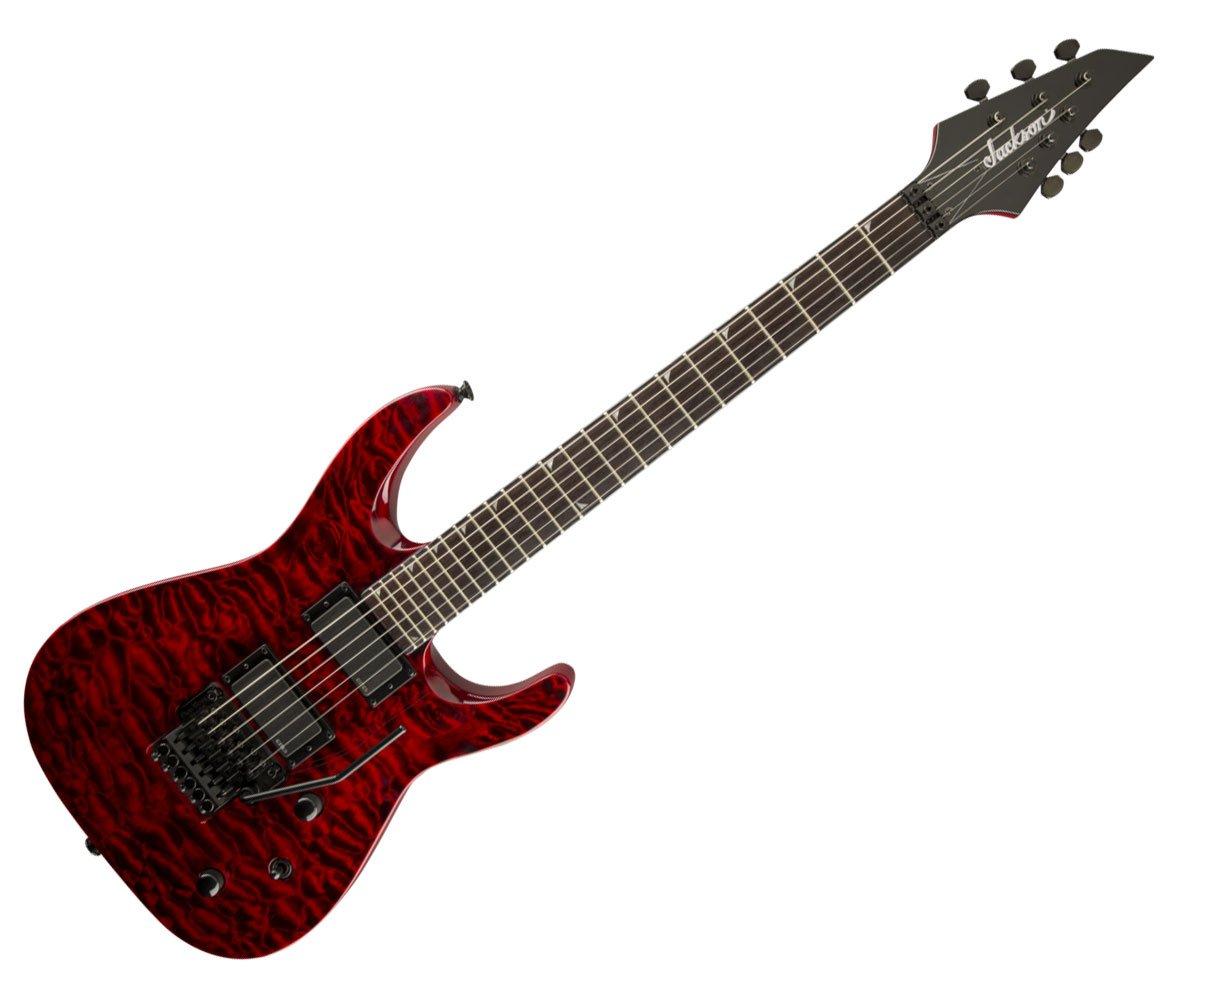 Cheap Jackson SLATXMG Q 3-6 Electric Guitar Trans Red B-Stock Black Friday & Cyber Monday 2019